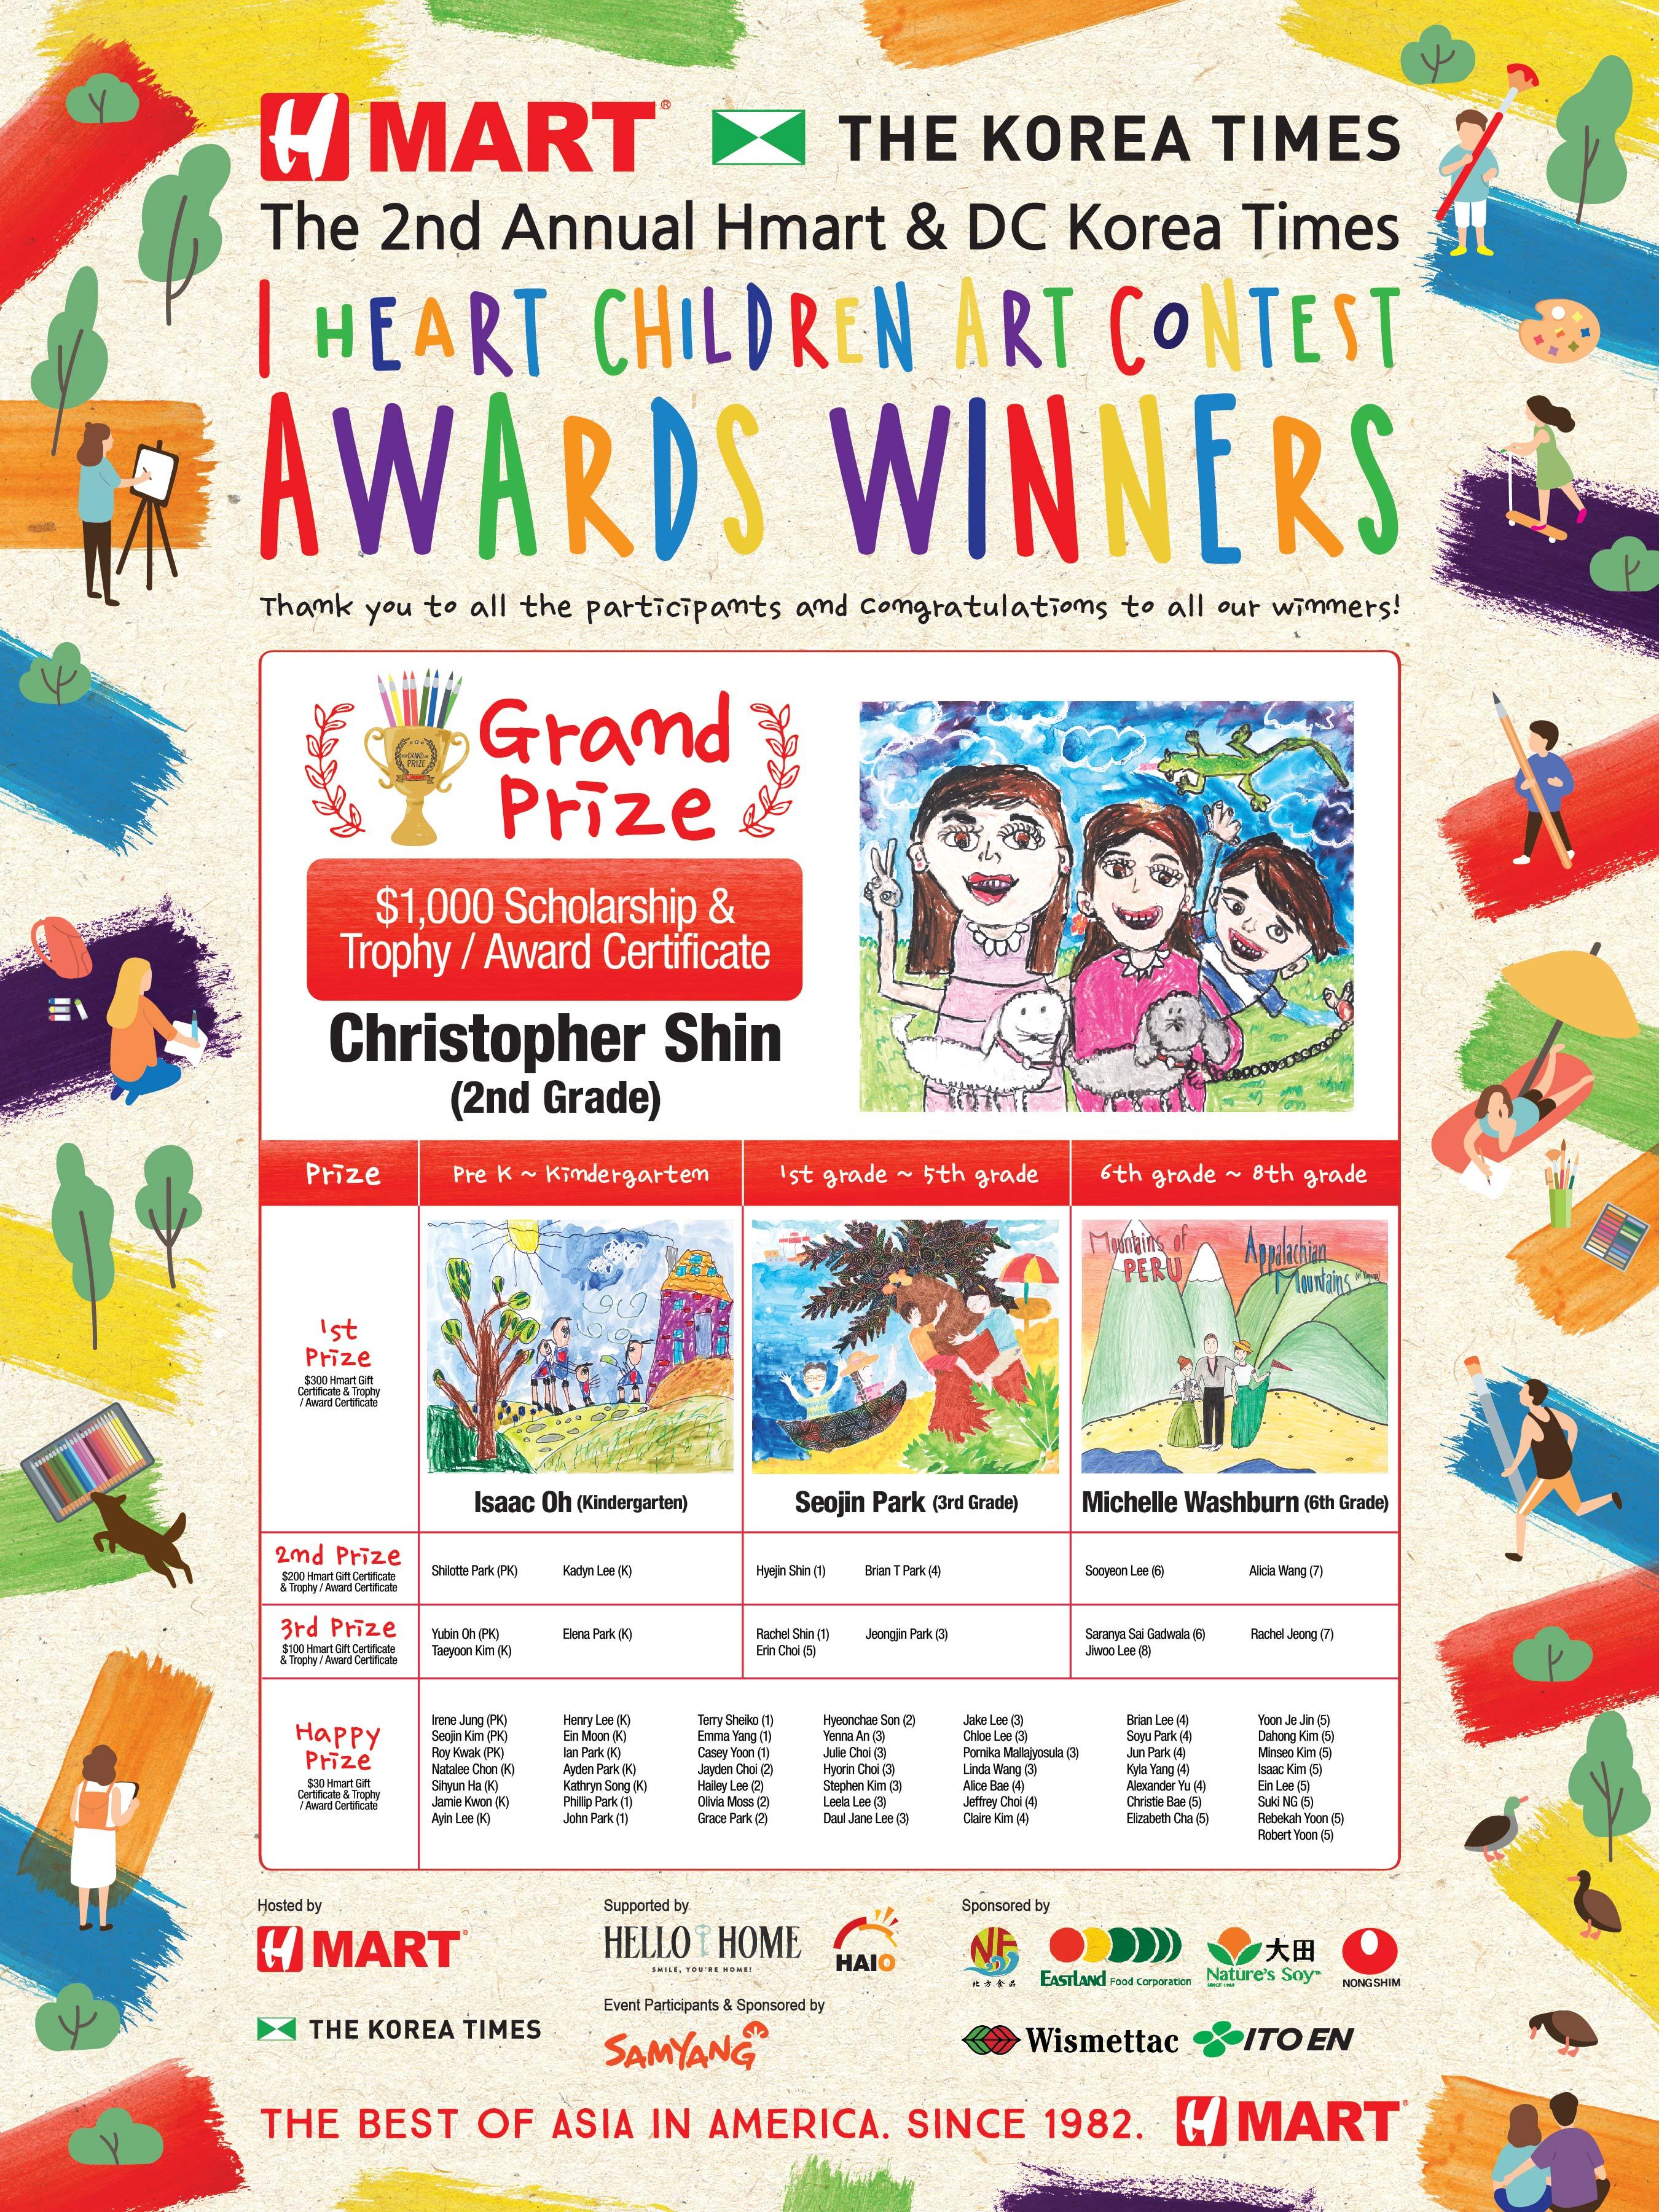 2018_VA 어린이 그림그리기 대회 수상자_POSTER-01